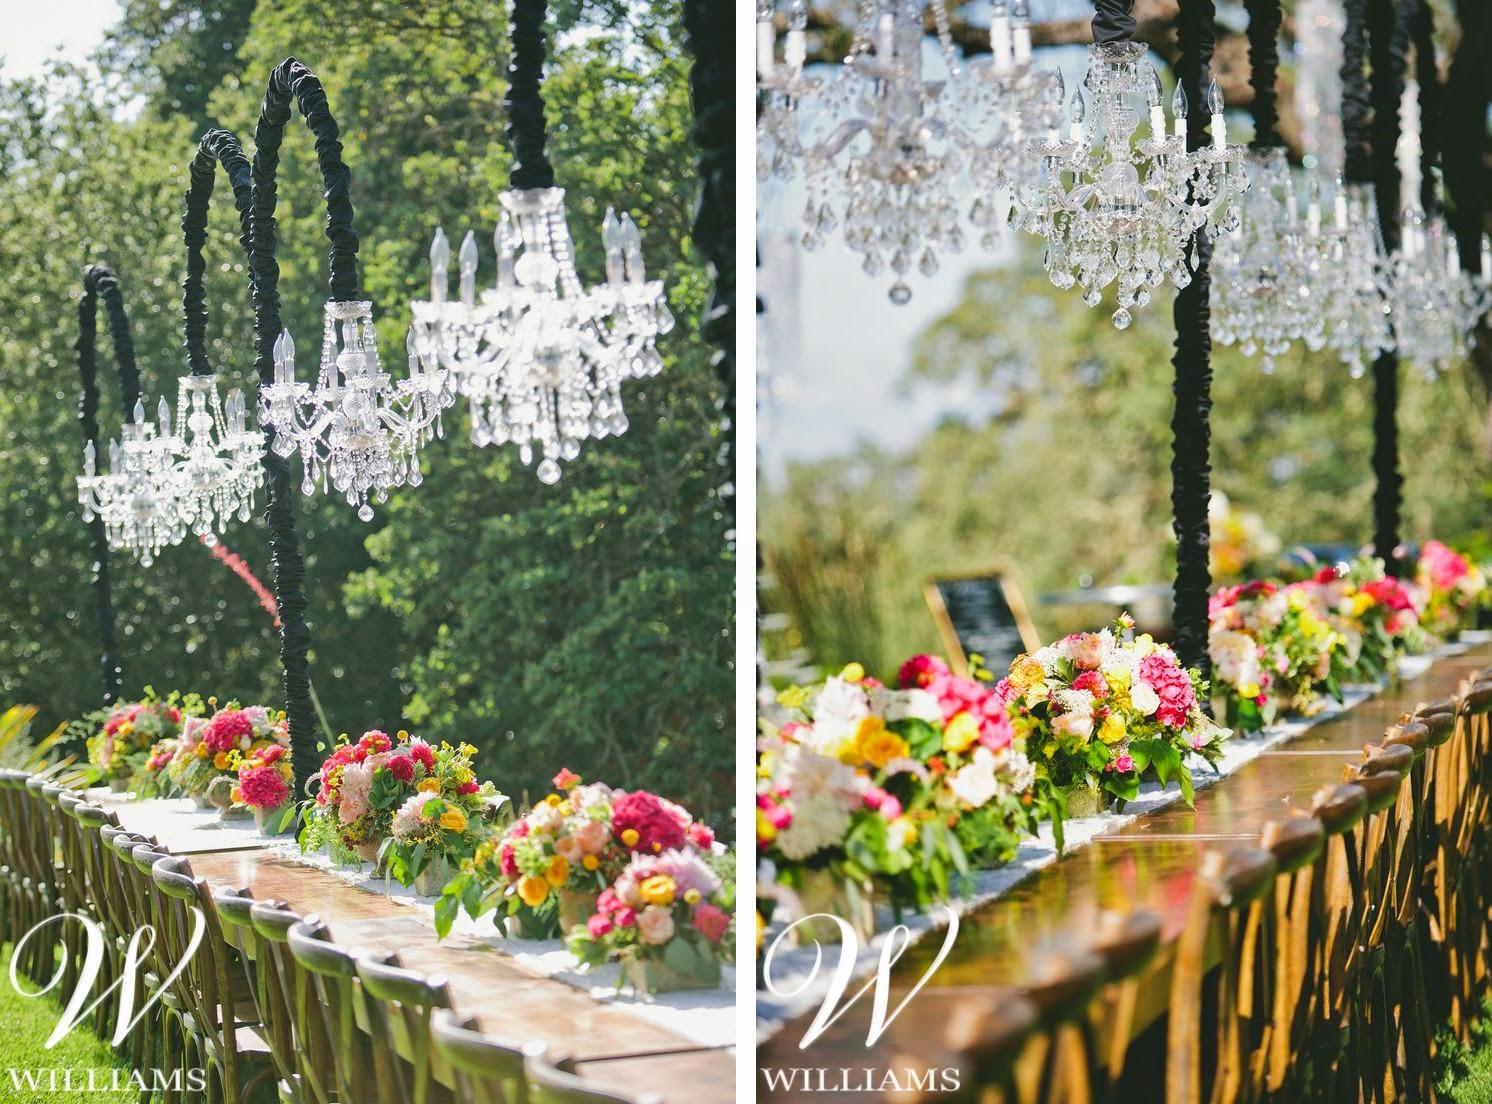 williams party rentals rustic chic backyard wedding